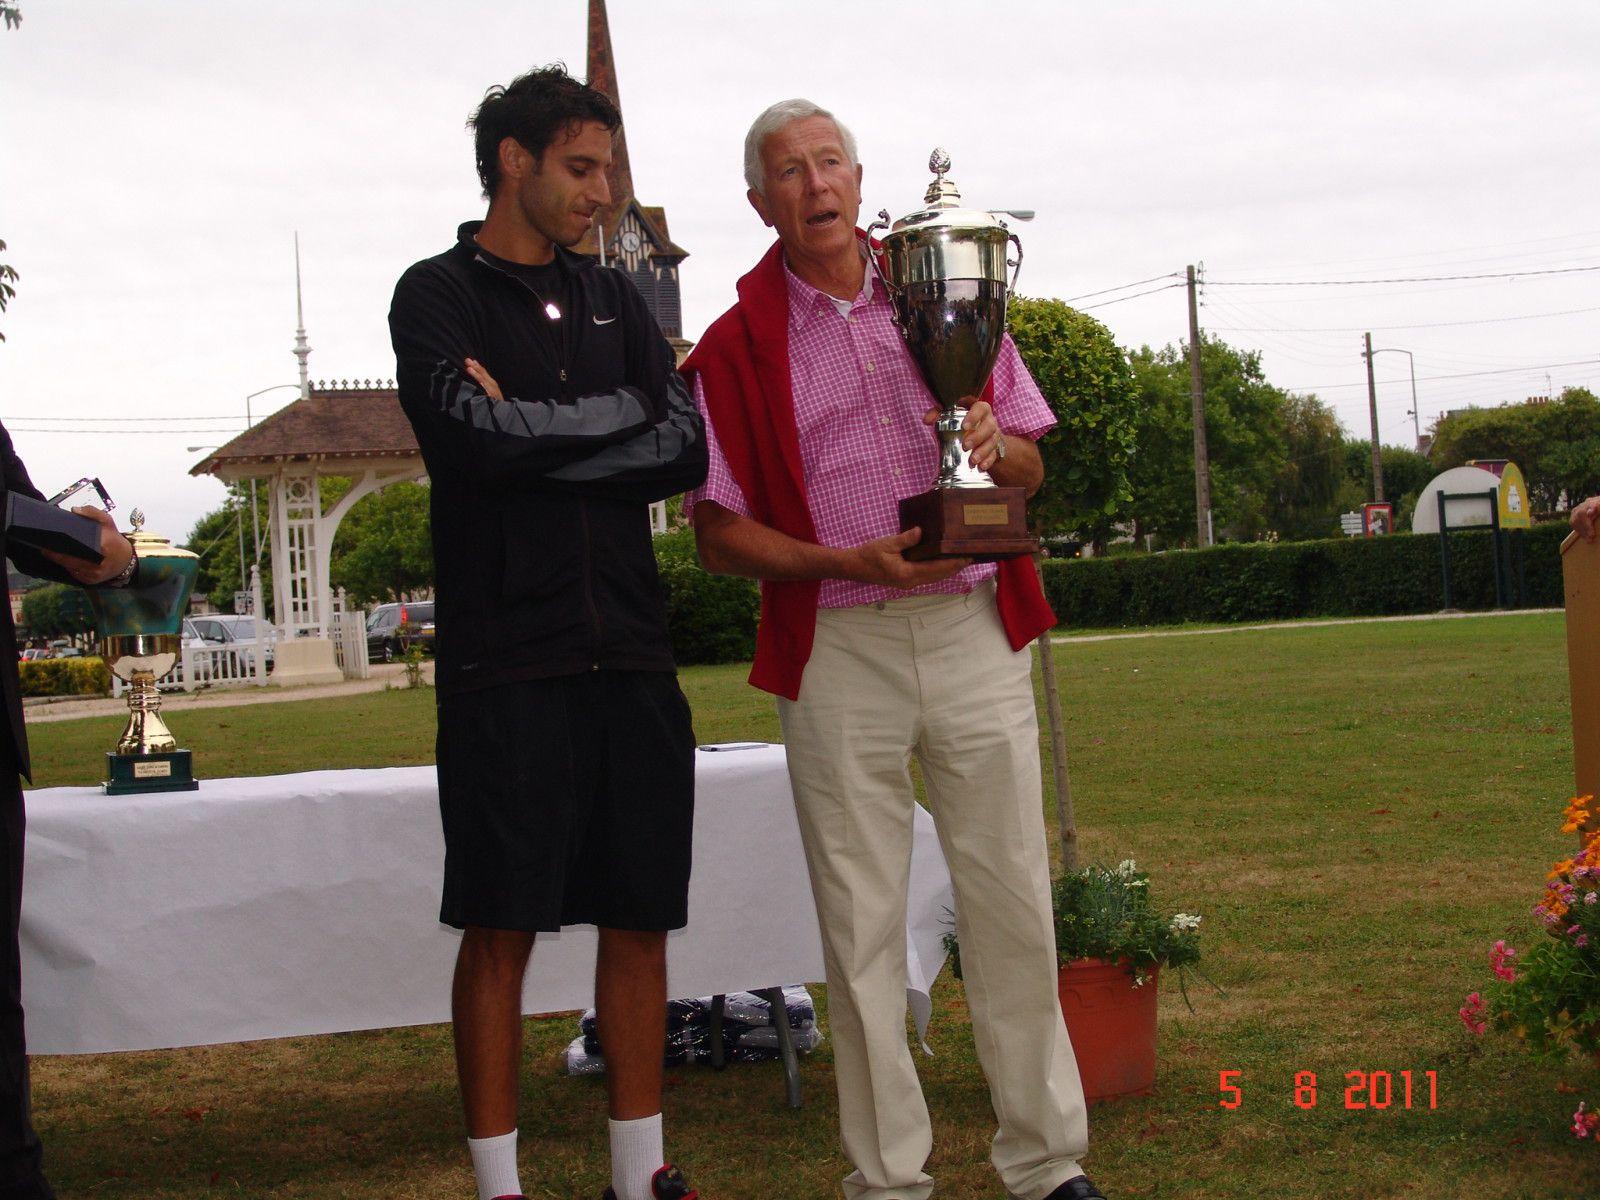 Vendredi 5 Aout vainqueurs : PETTIGROSSO Mariano - 30 VEDY Aurélie N° 28